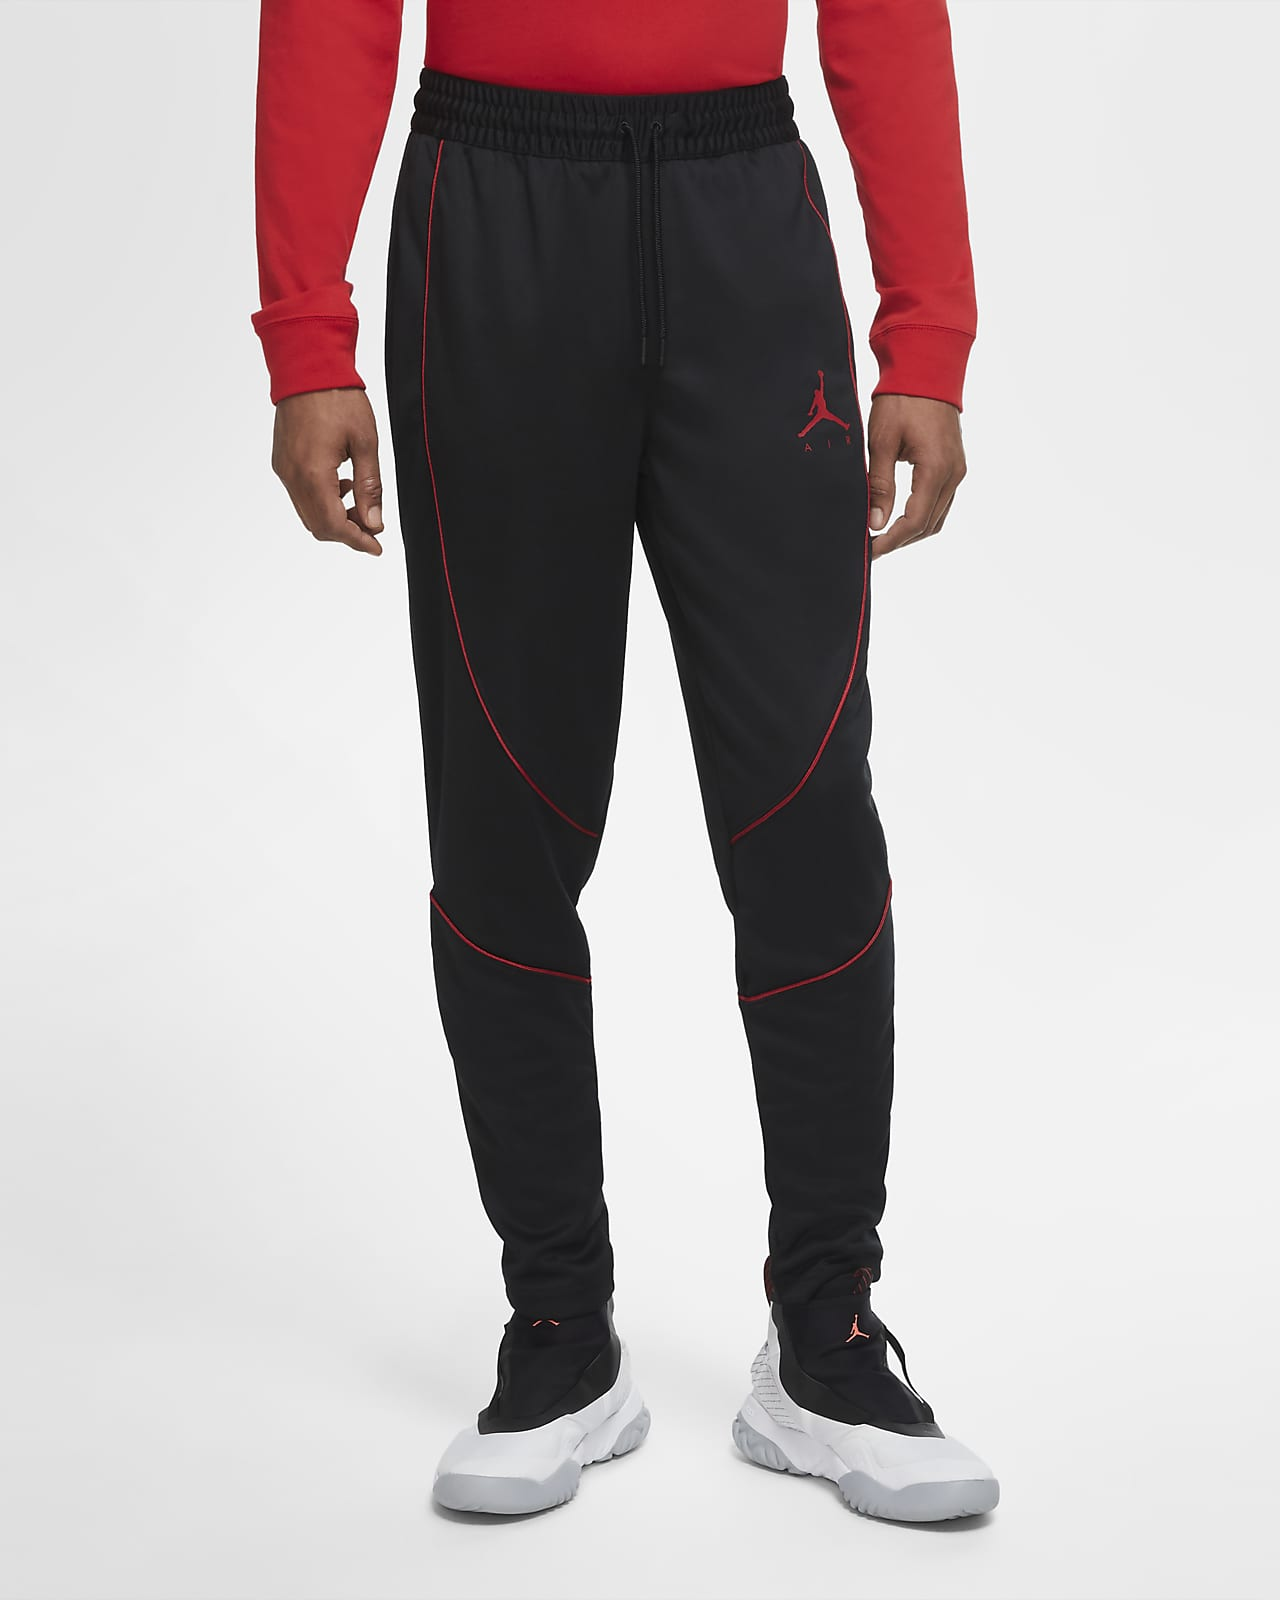 Inferir Armonía Viajero  Jordan Jumpman Air Pantalón de chándal - Hombre. Nike ES